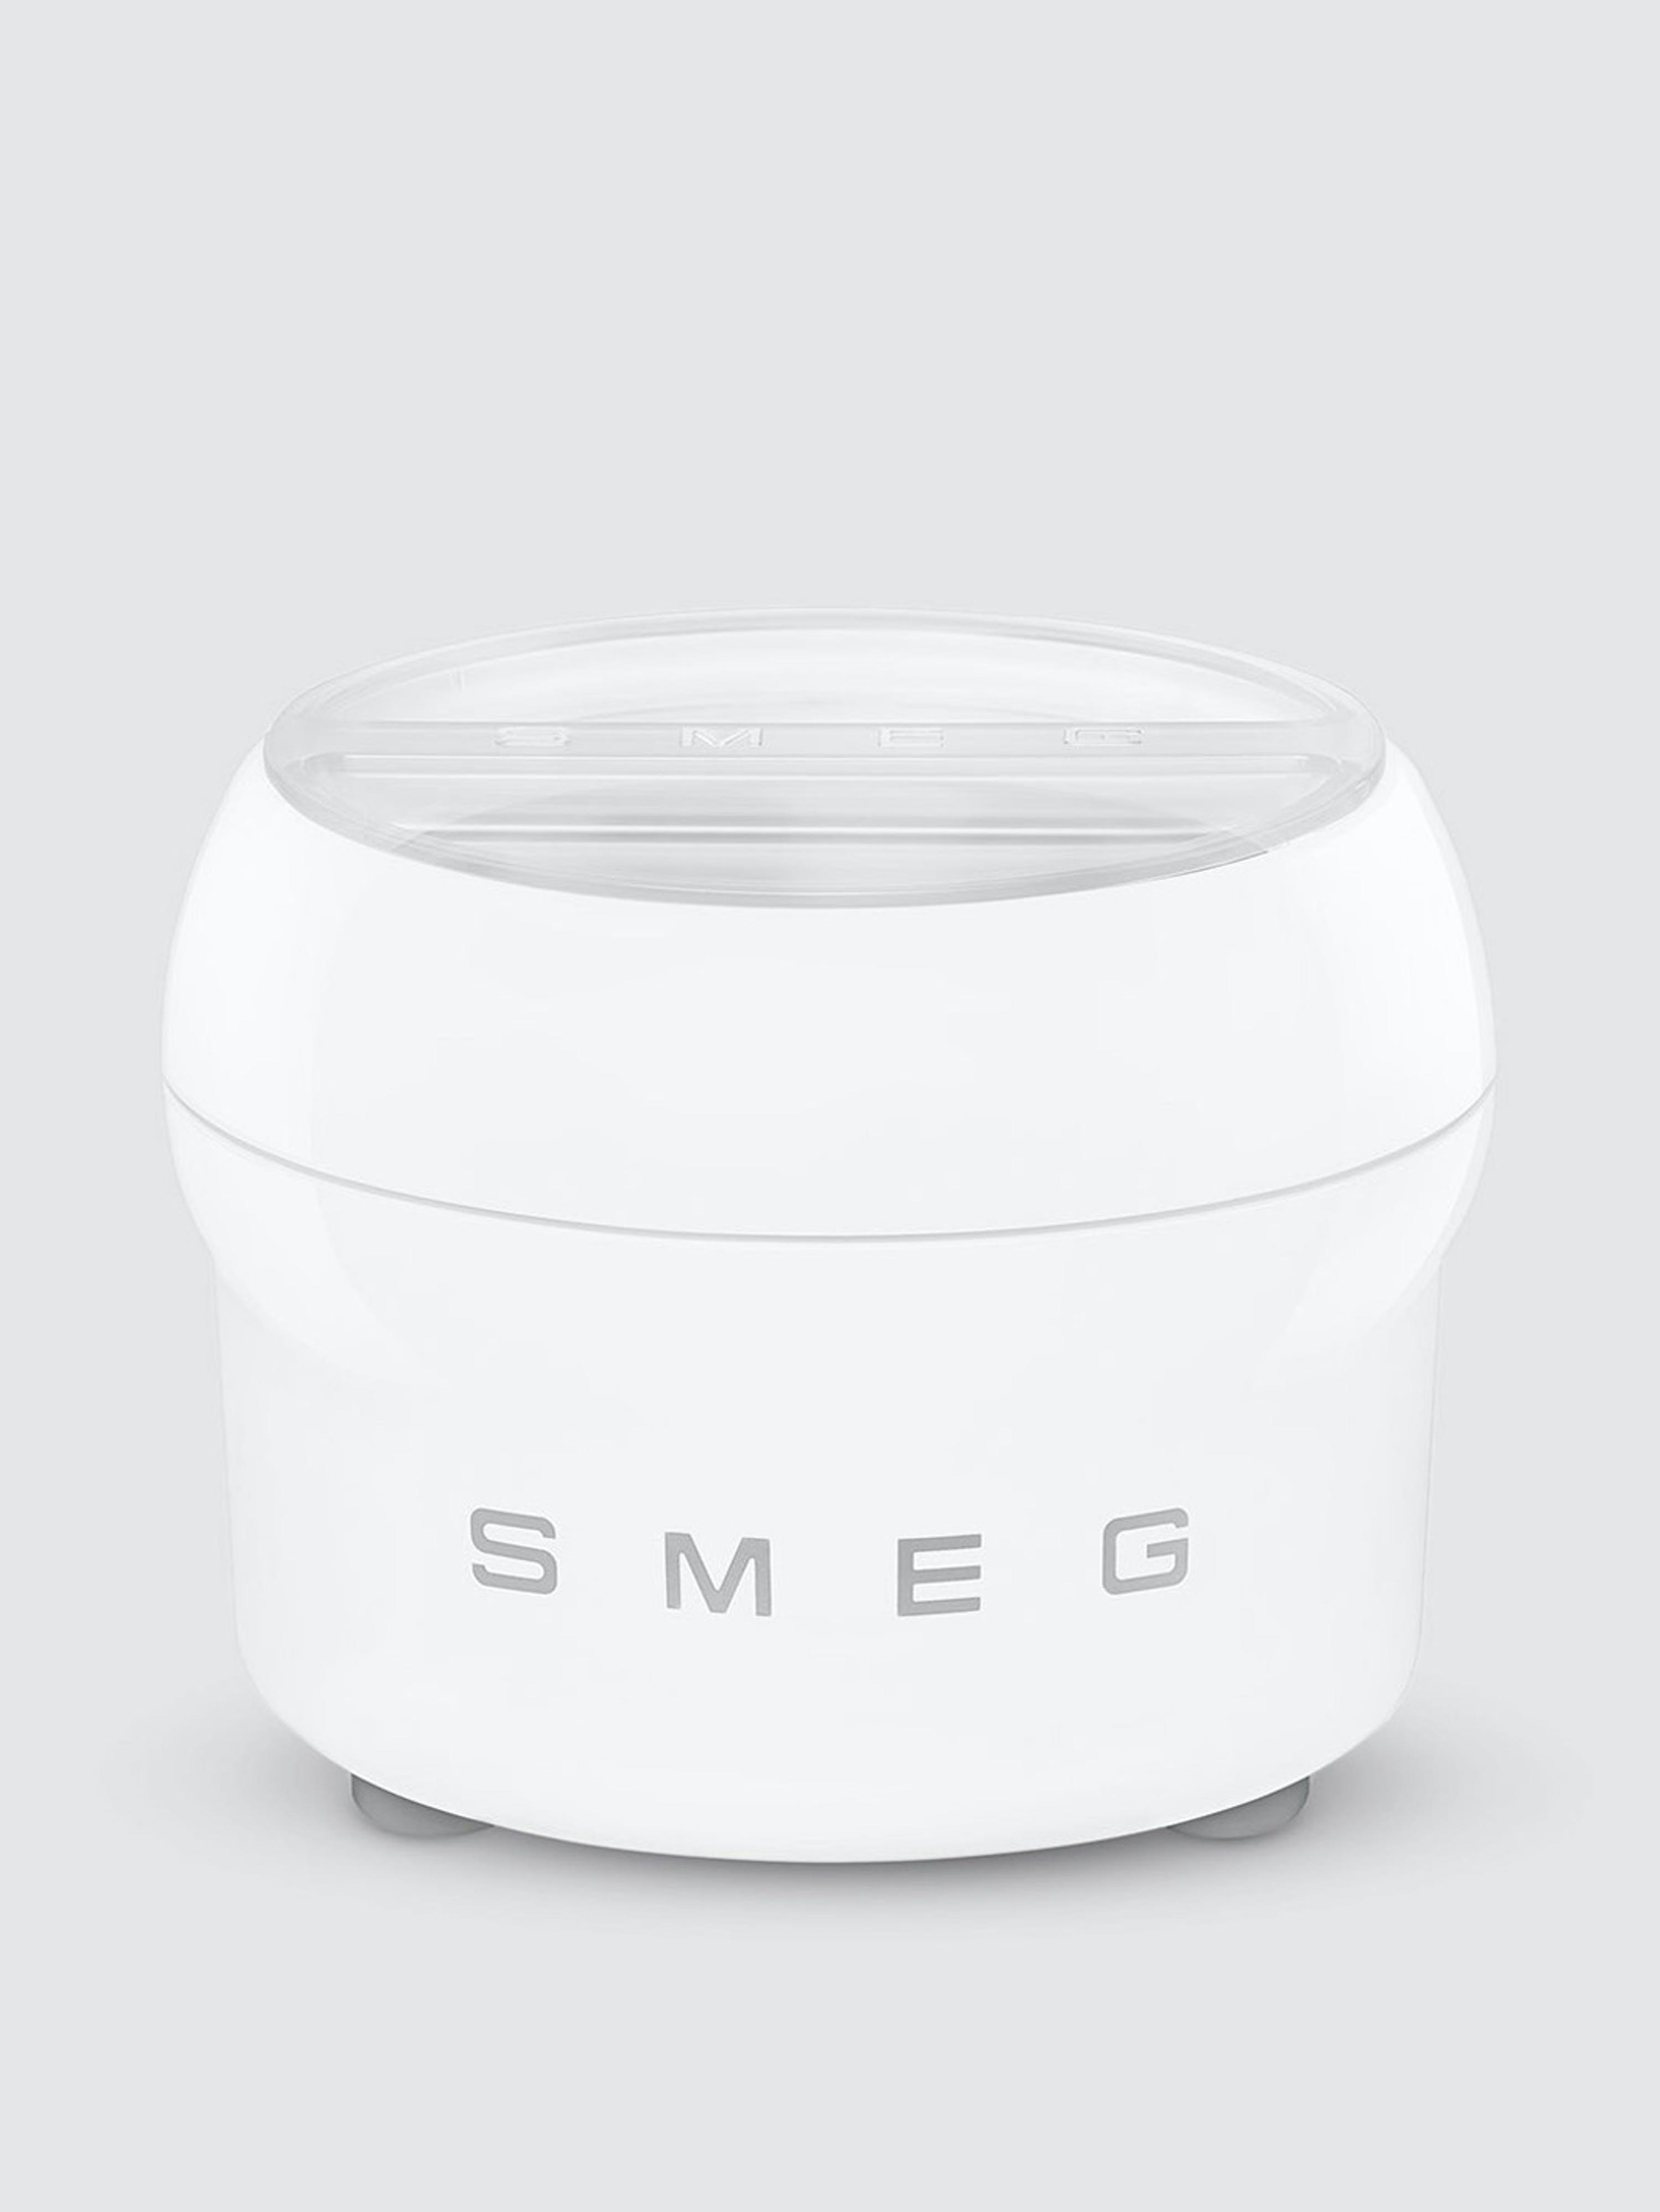 Smeg Ice Cream Maker Accessory  - White